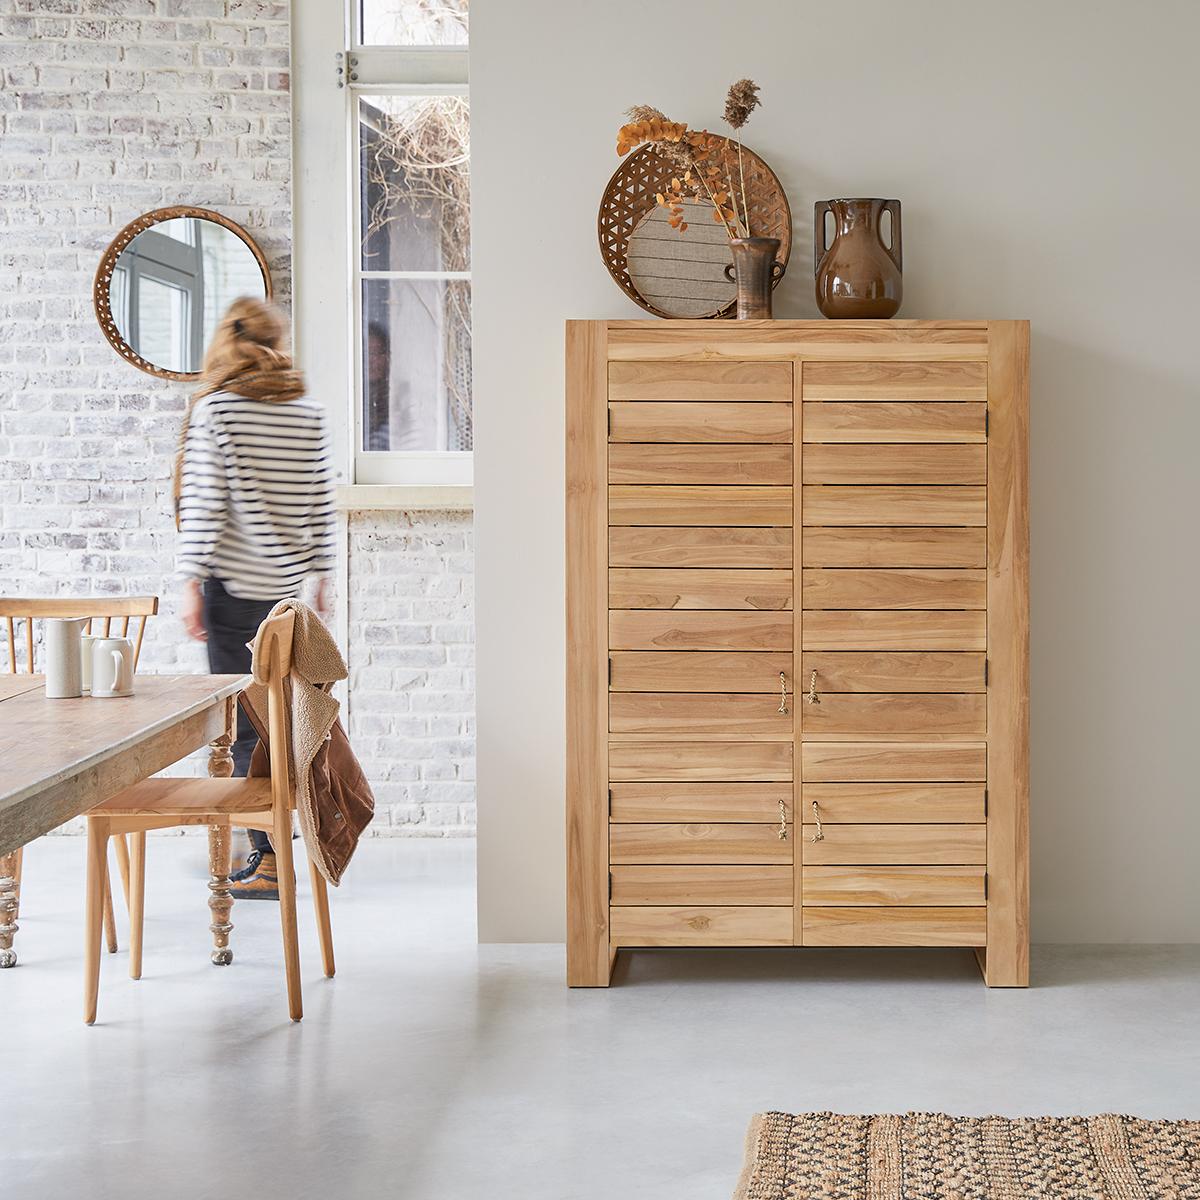 Minimalys solid teak Dresser 110 cm